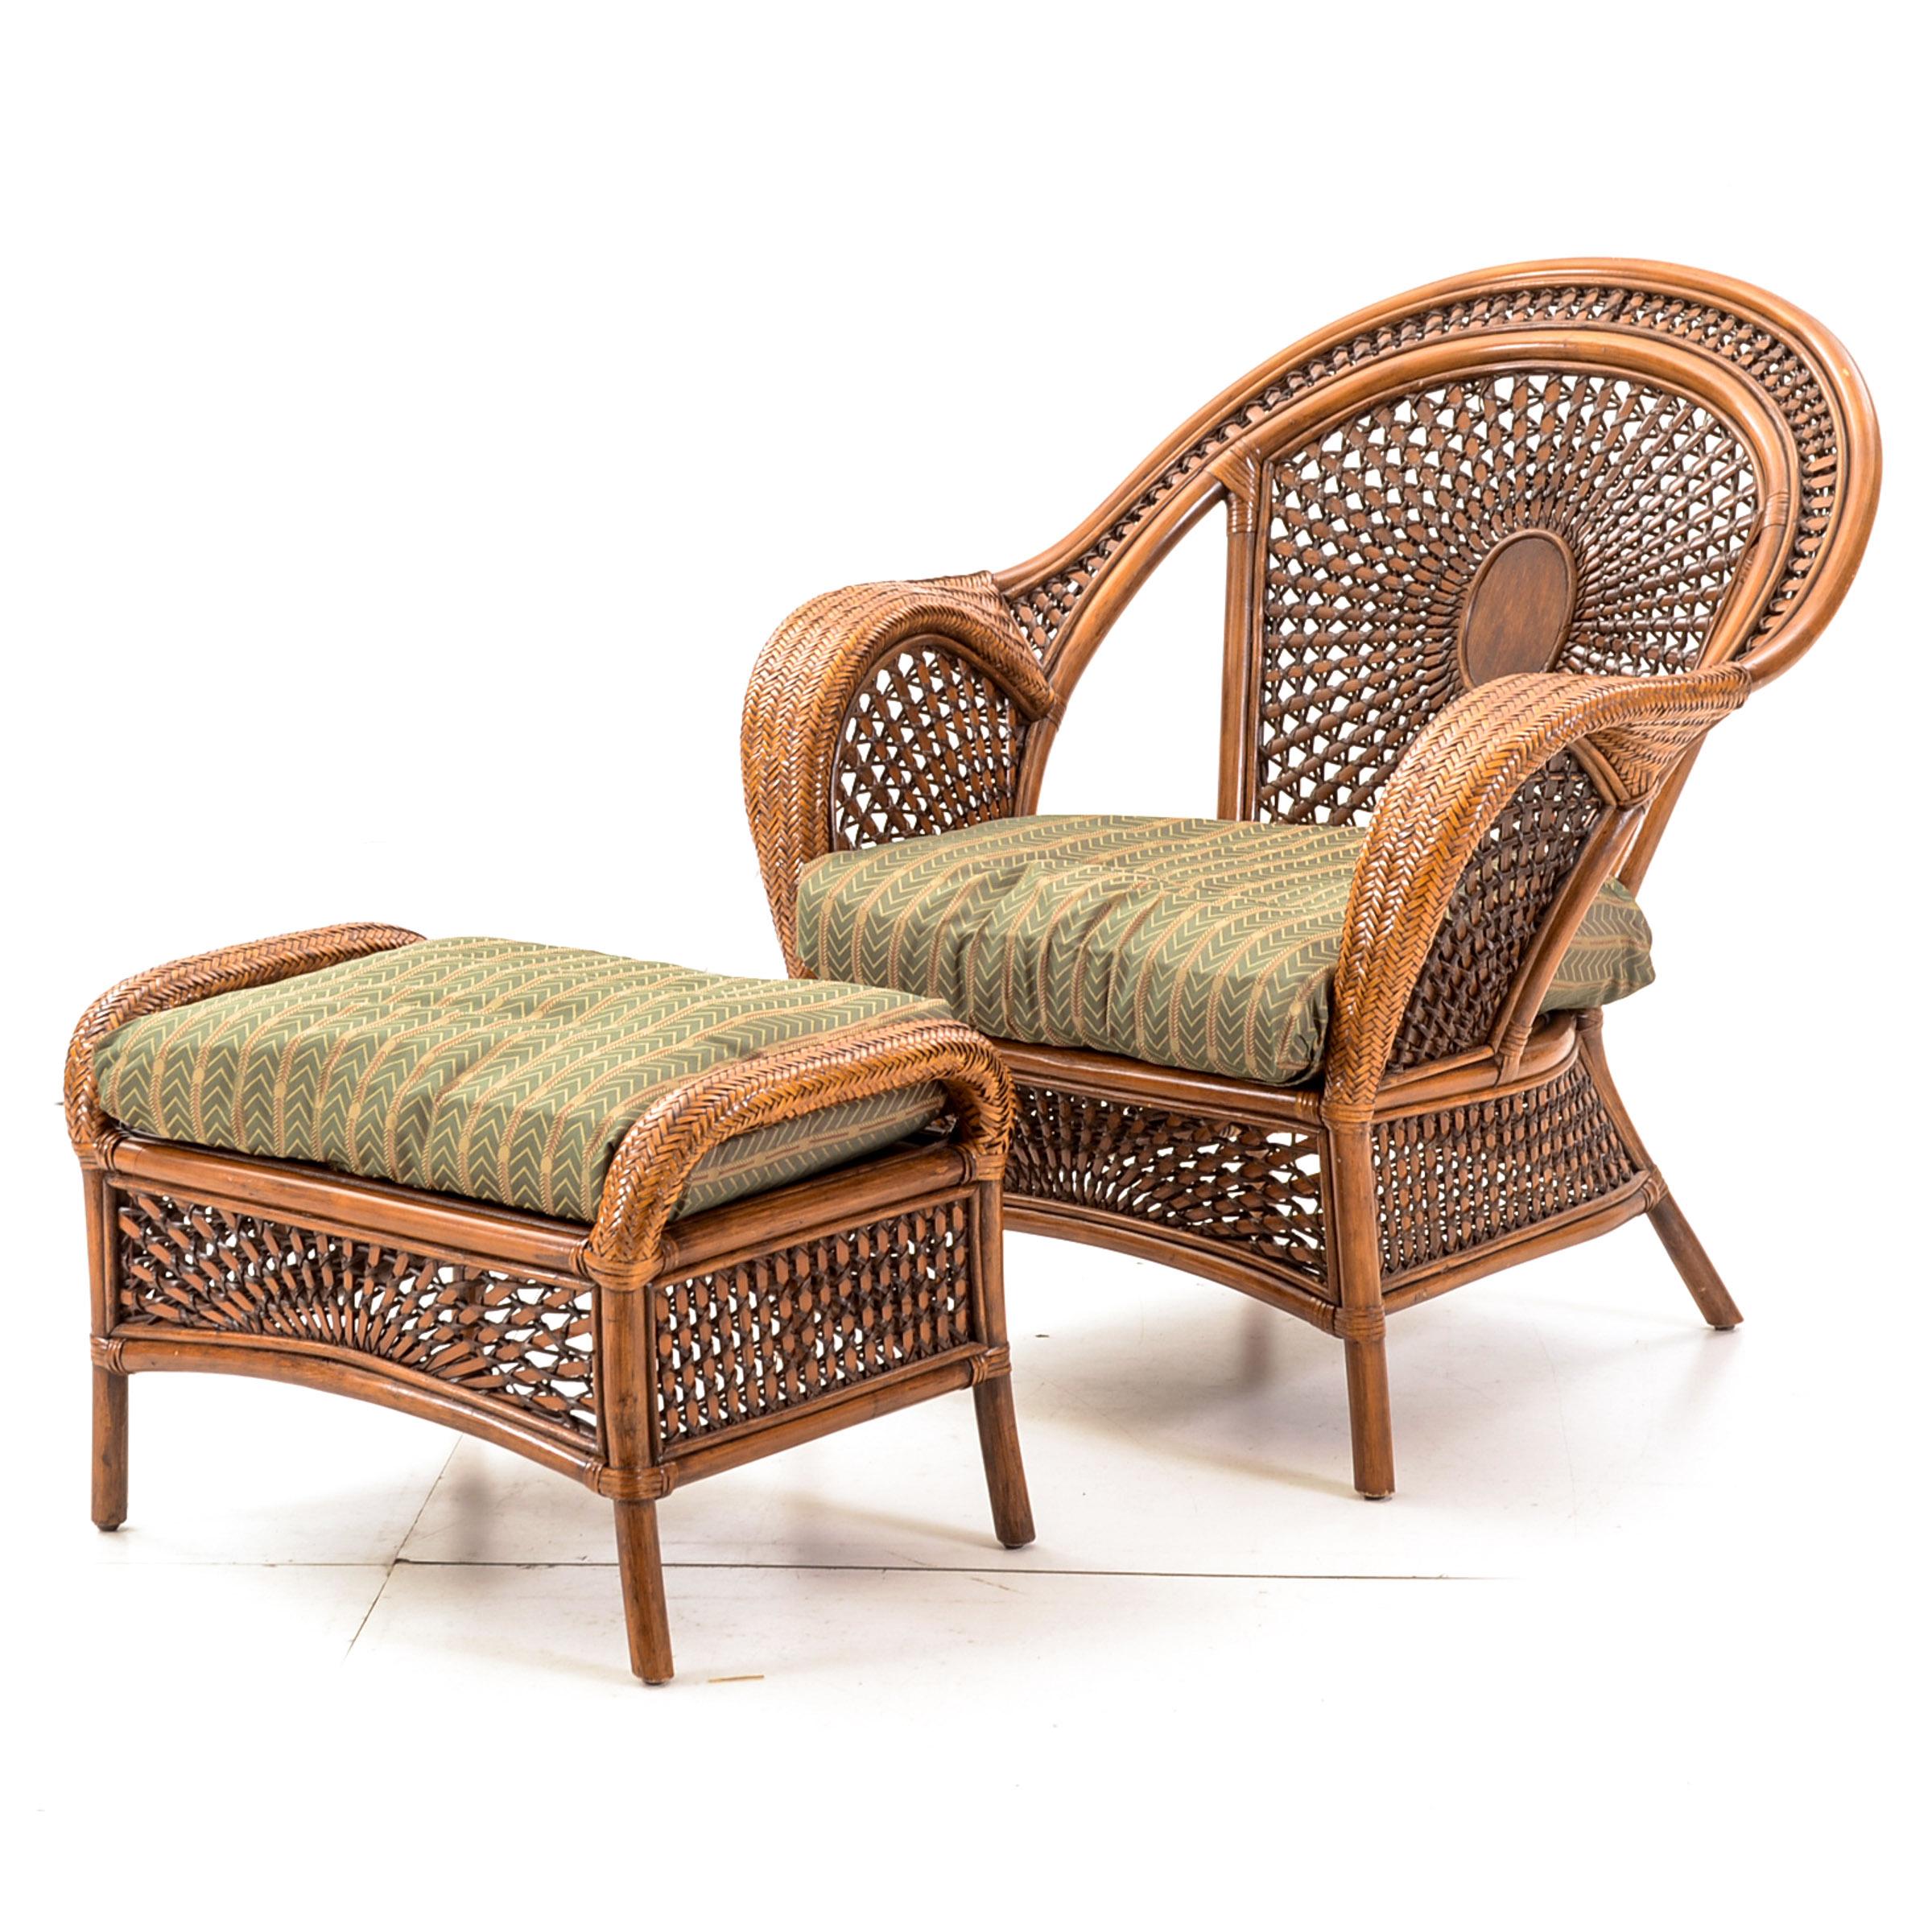 pier one rattan chair ergonomic home office wicker with ottoman ebth